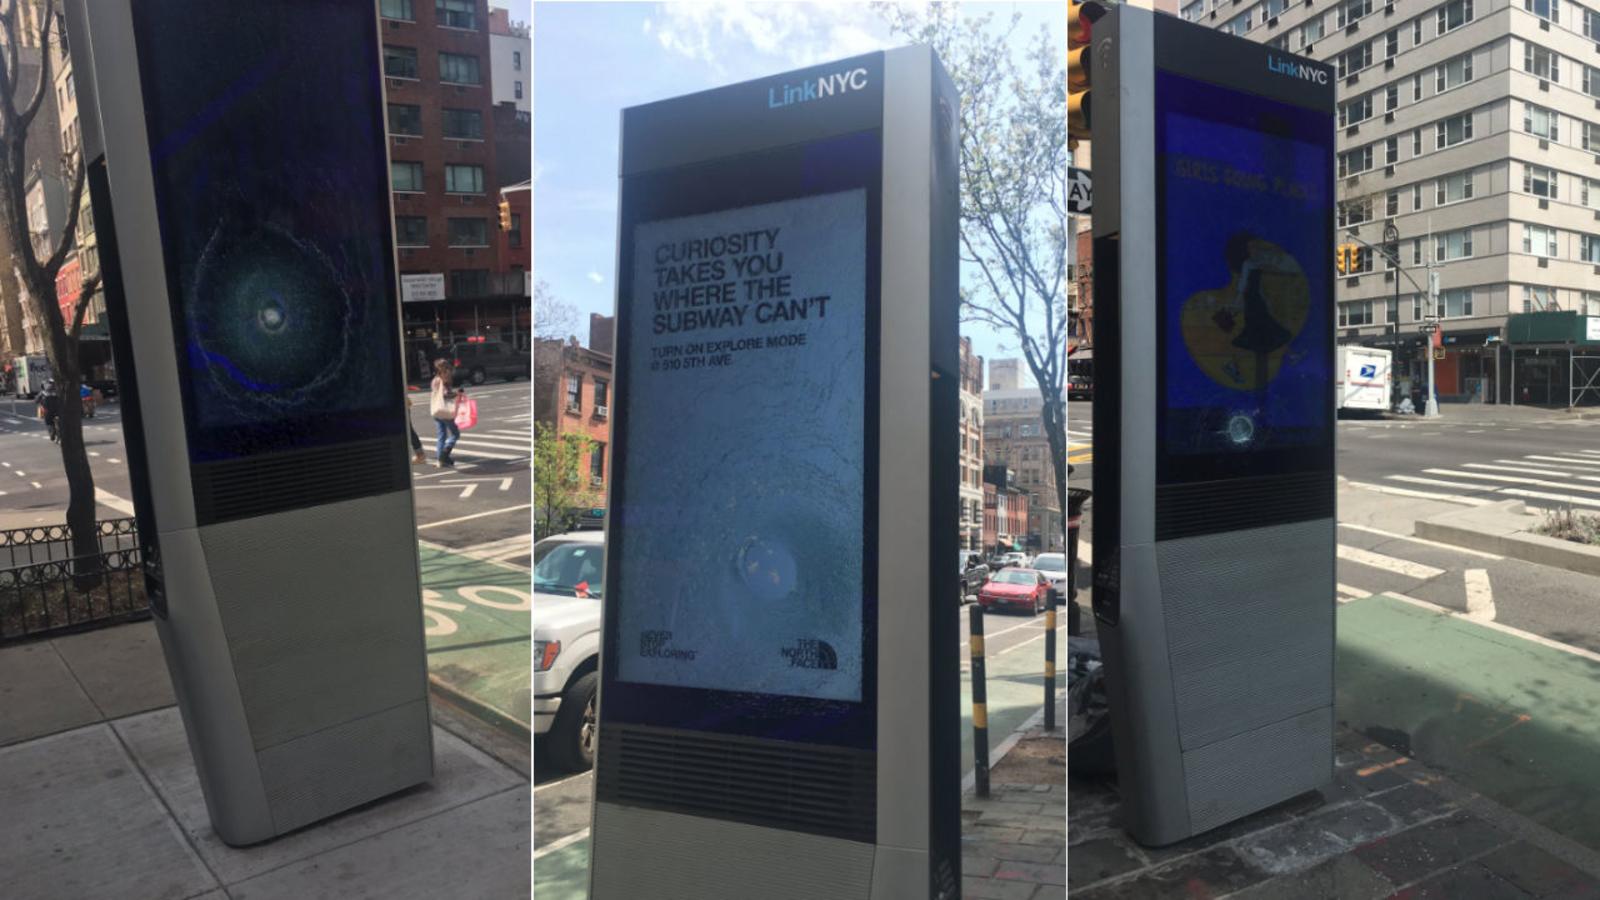 At least 30 LinkNYC kiosks vandalized in Manhattan